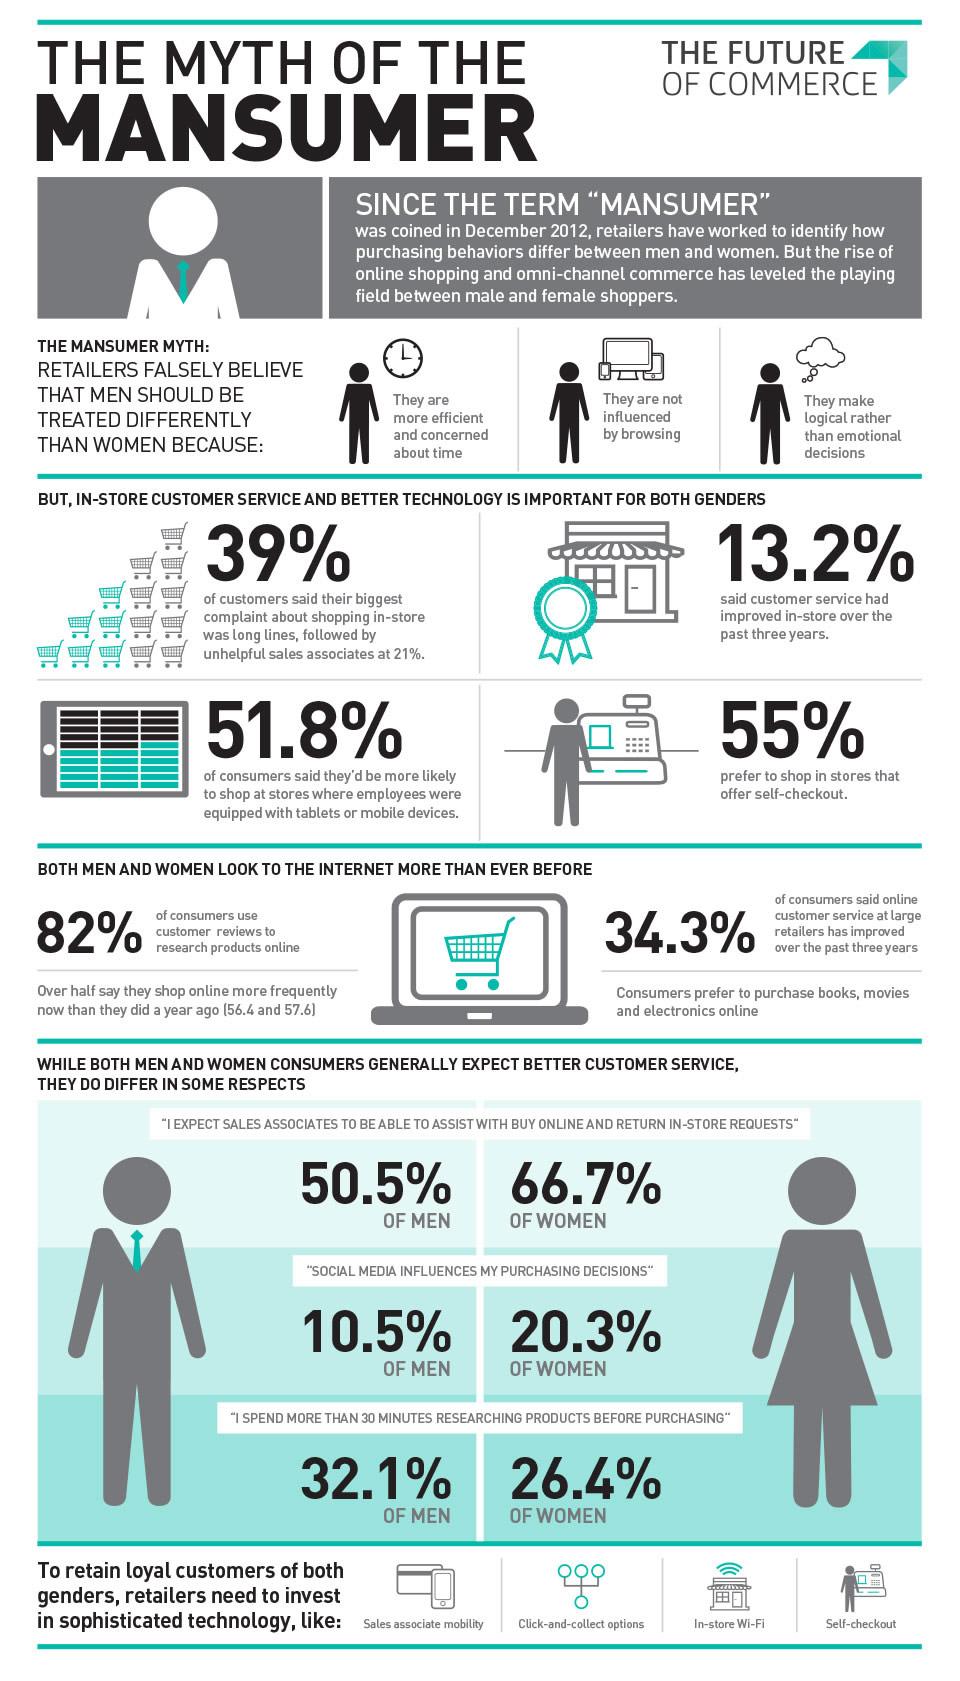 Myth_of_the_Mansumer_Infographic.jpg